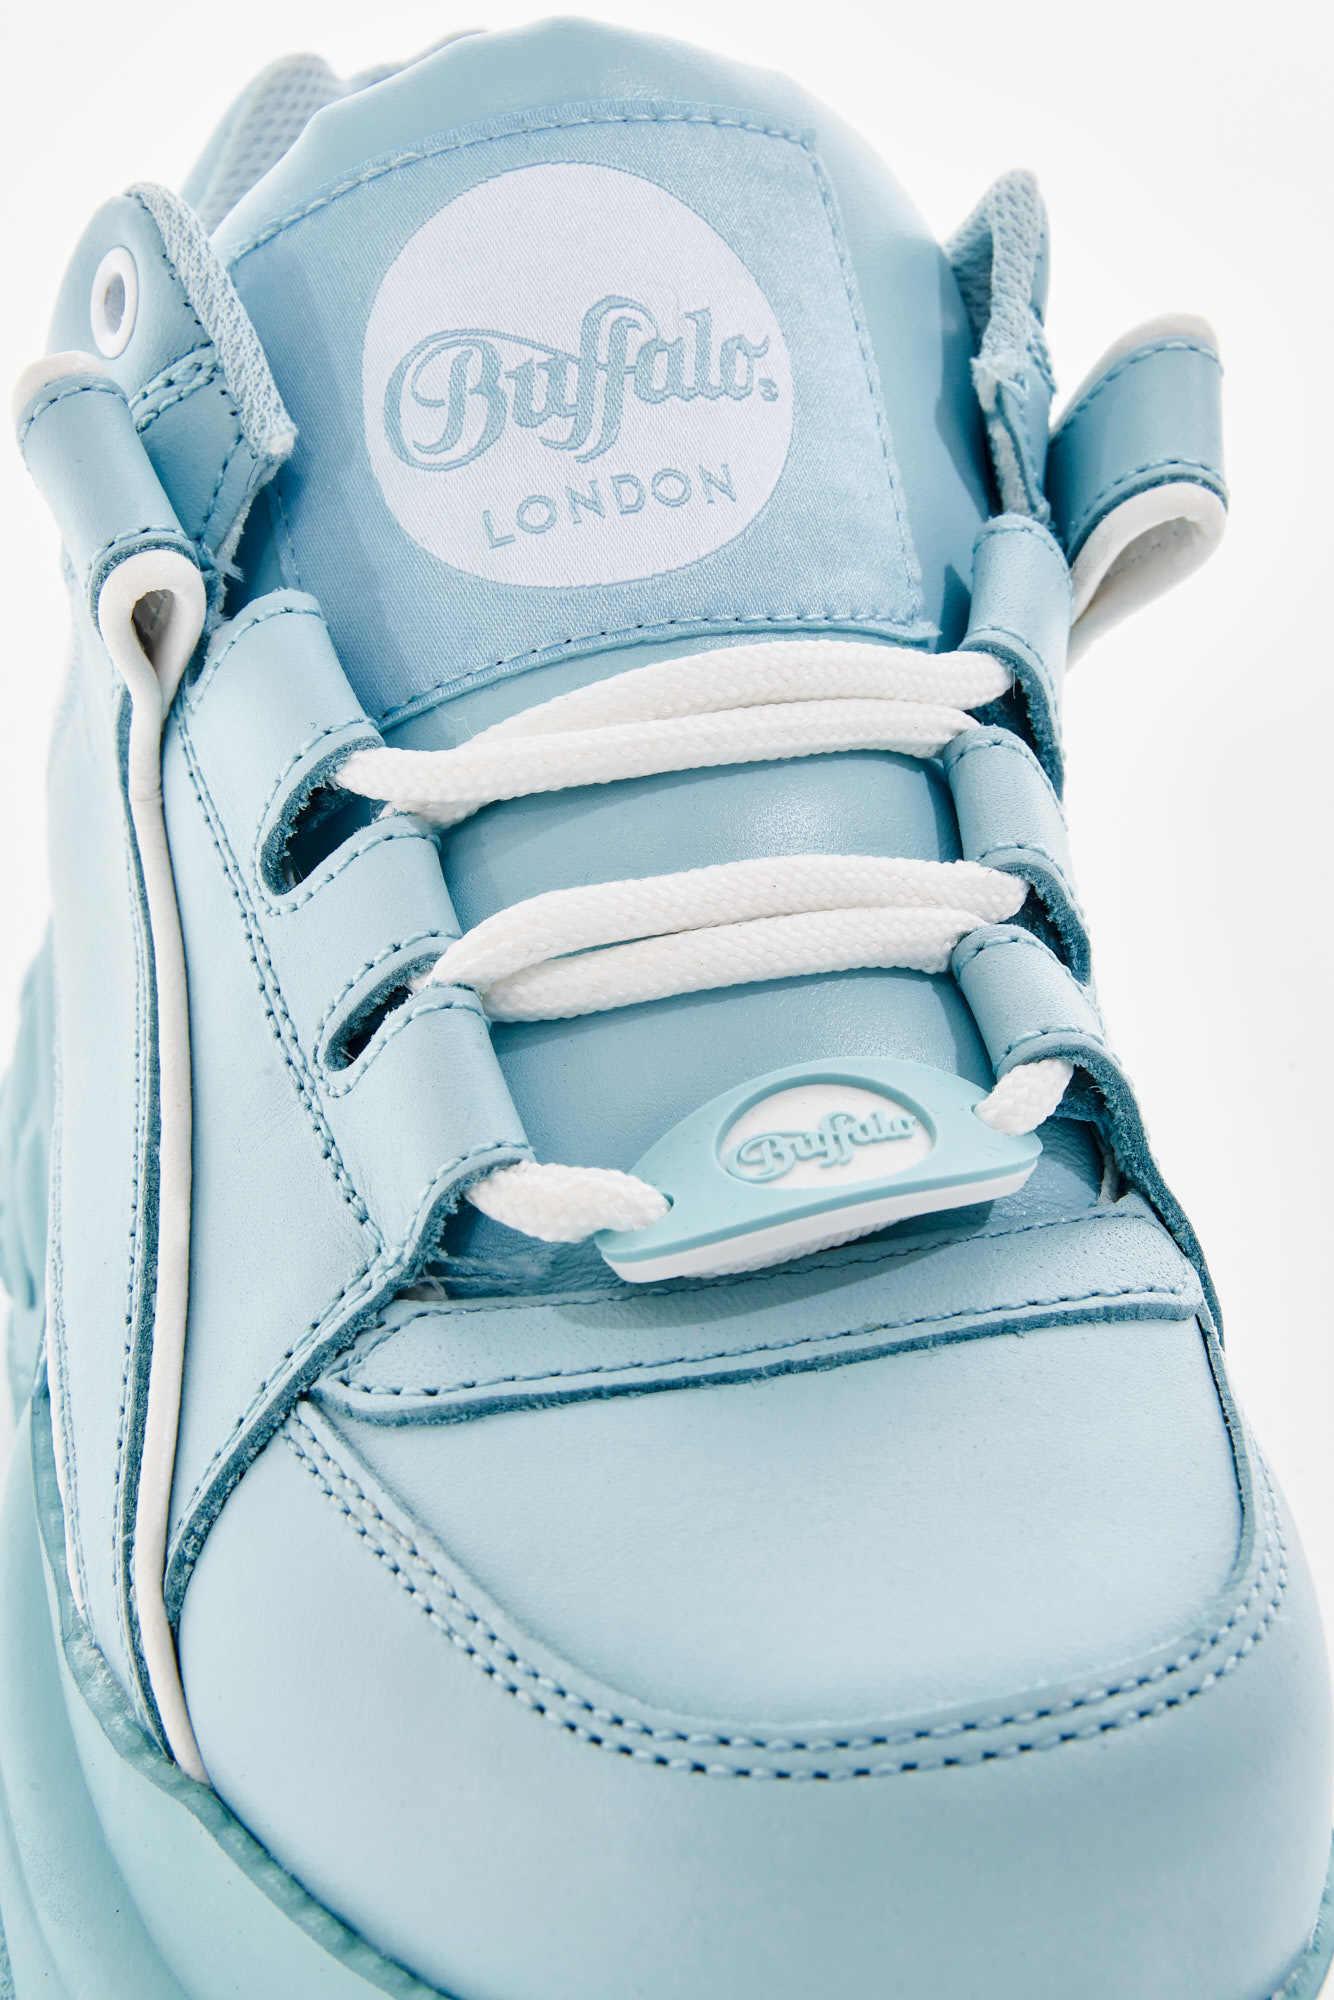 Ботинки Buffalo London Blue, Голубой